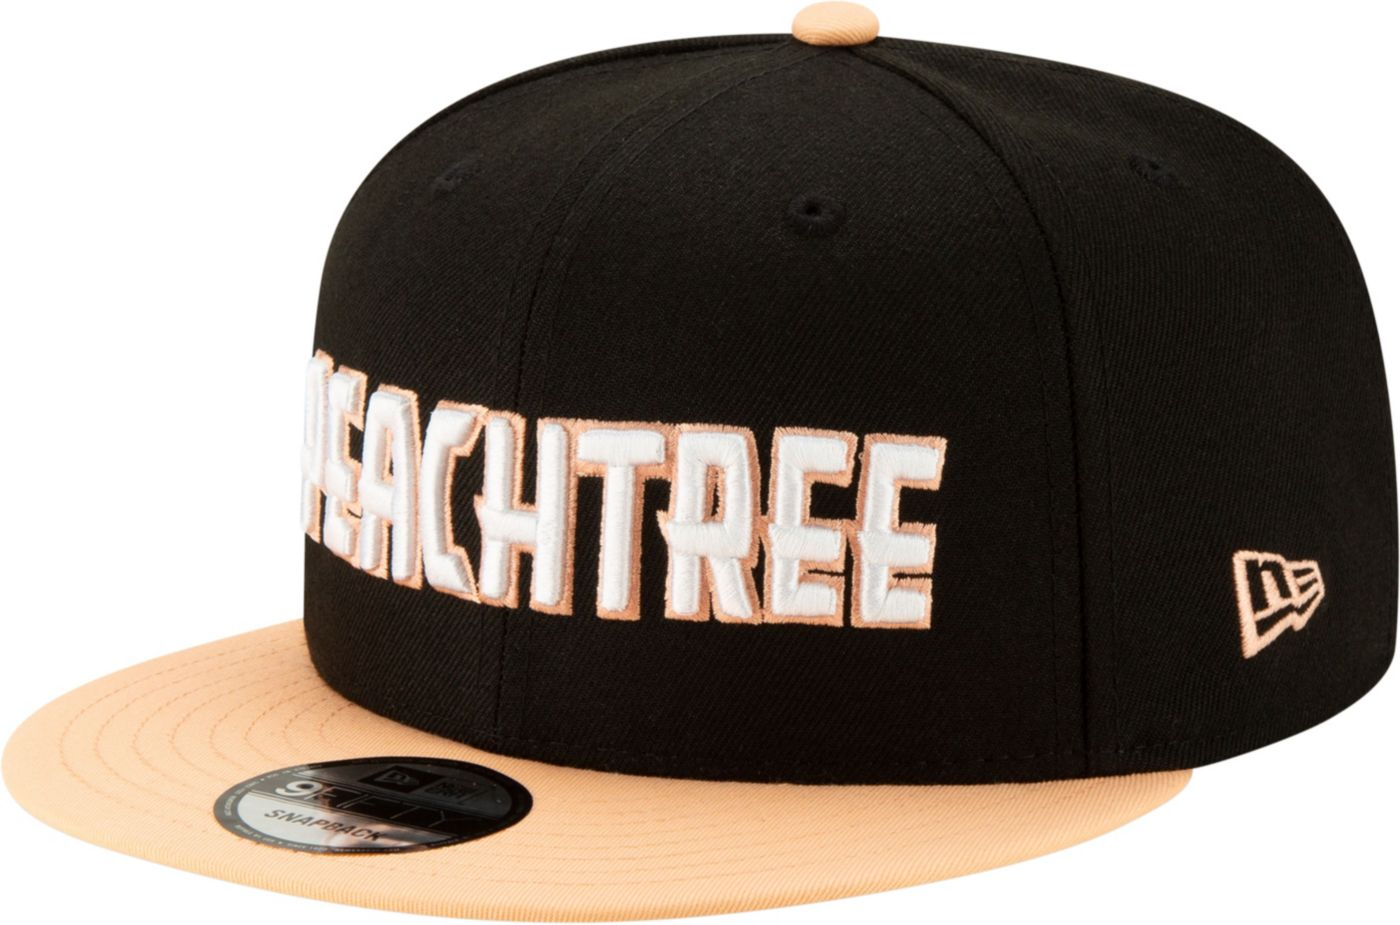 New Era Men's Atlanta Hawks 9Fifty City Edition Adjustable Snapback Hat